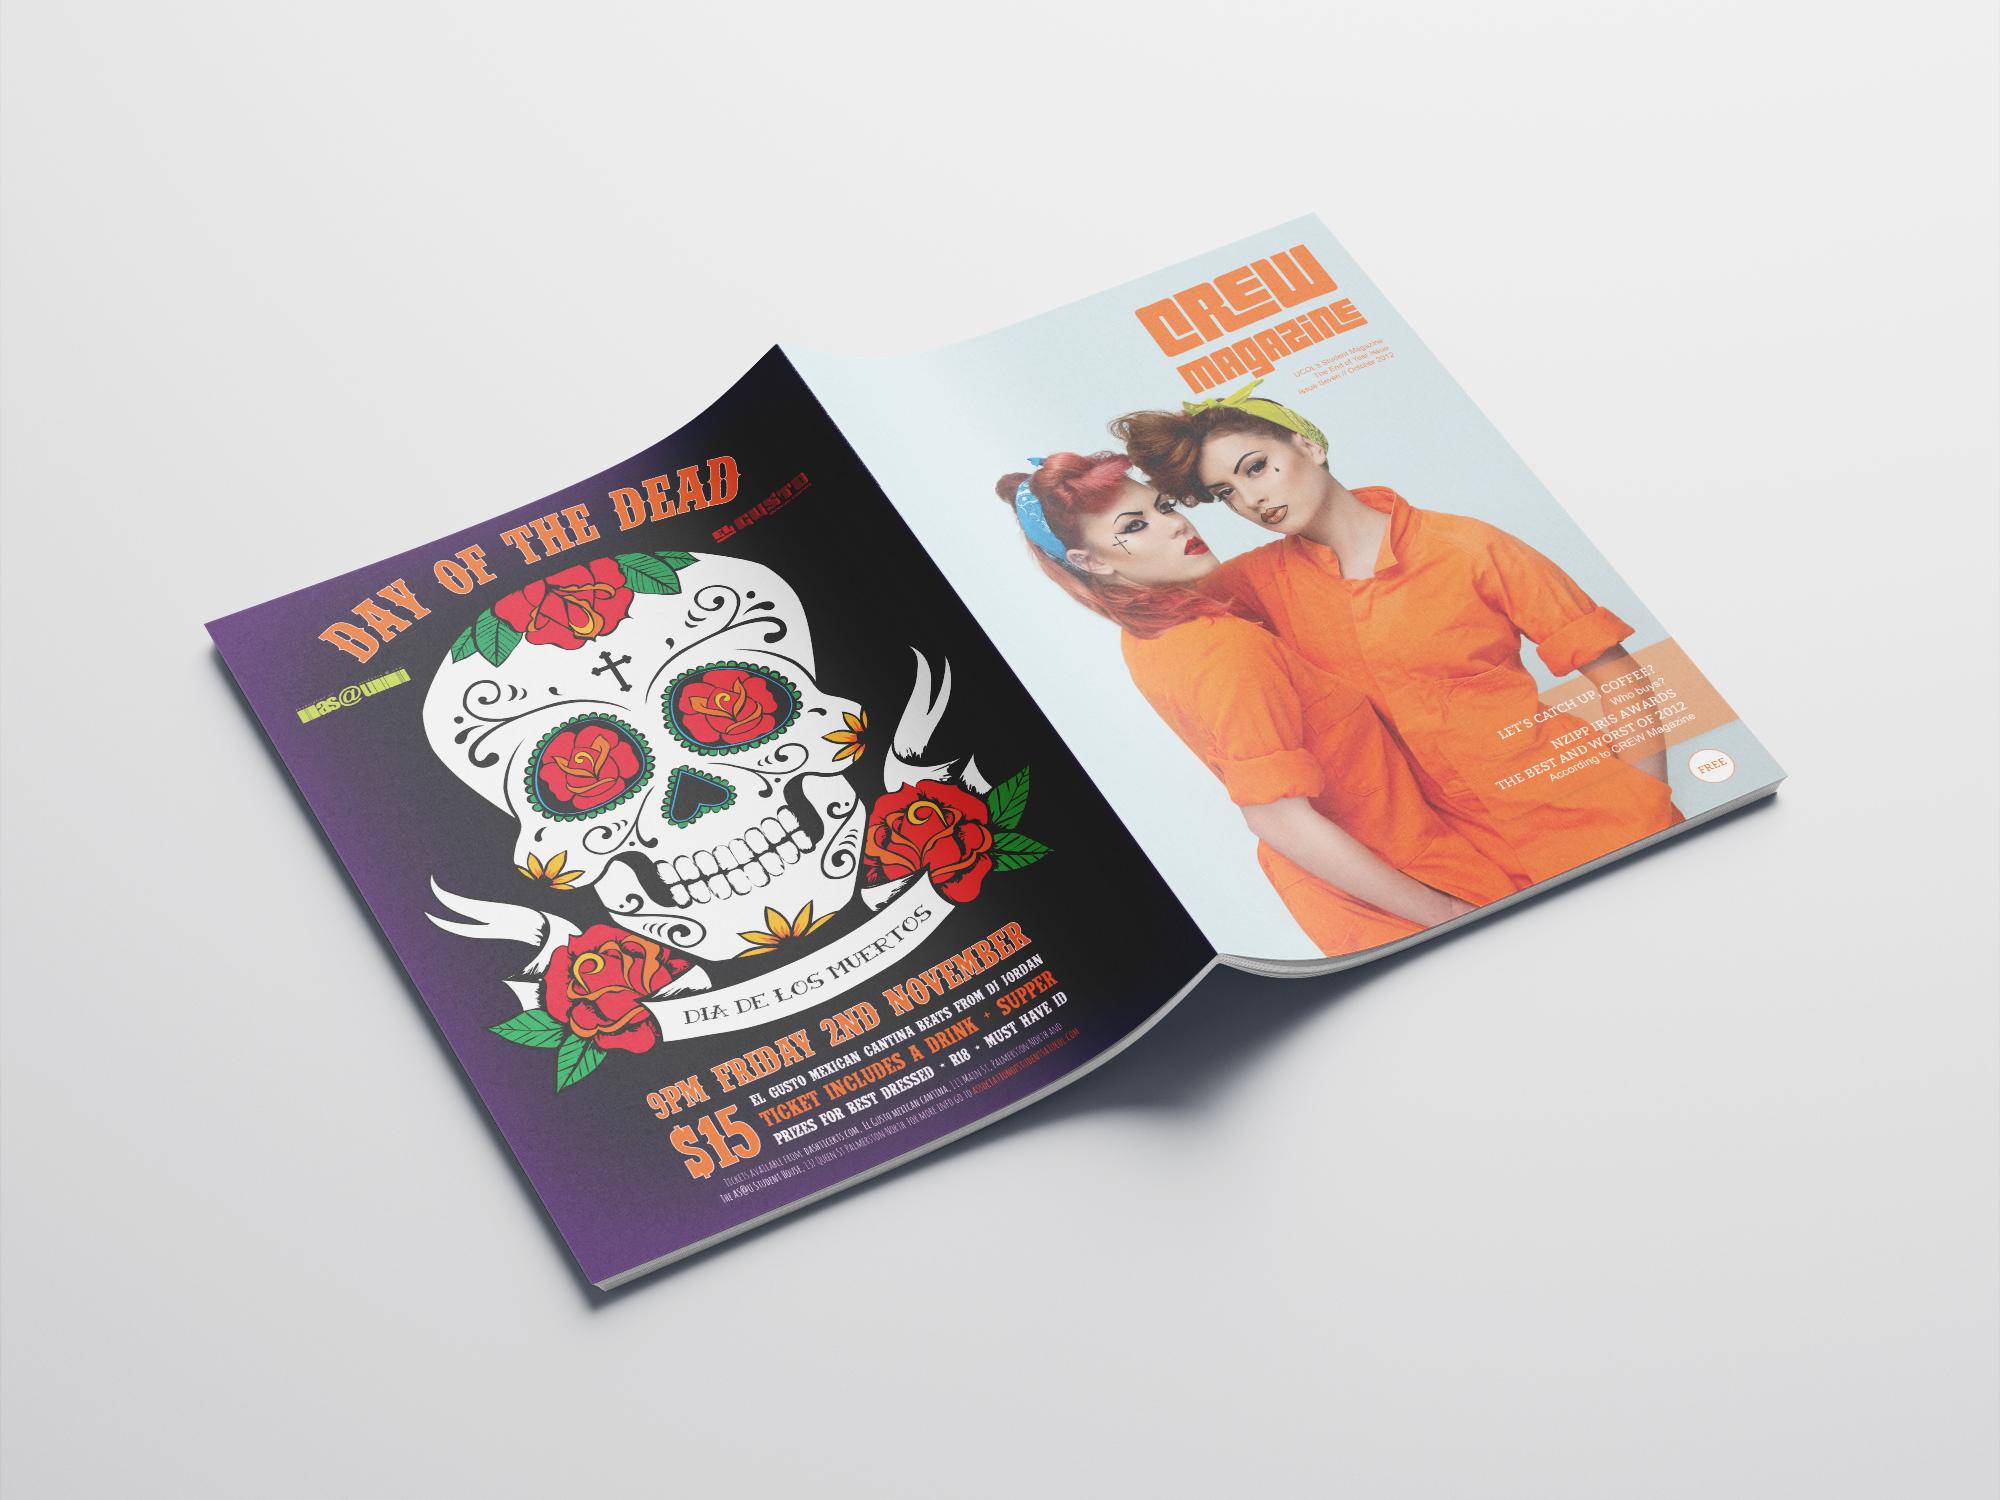 crew-oct-2012-cover.jpg